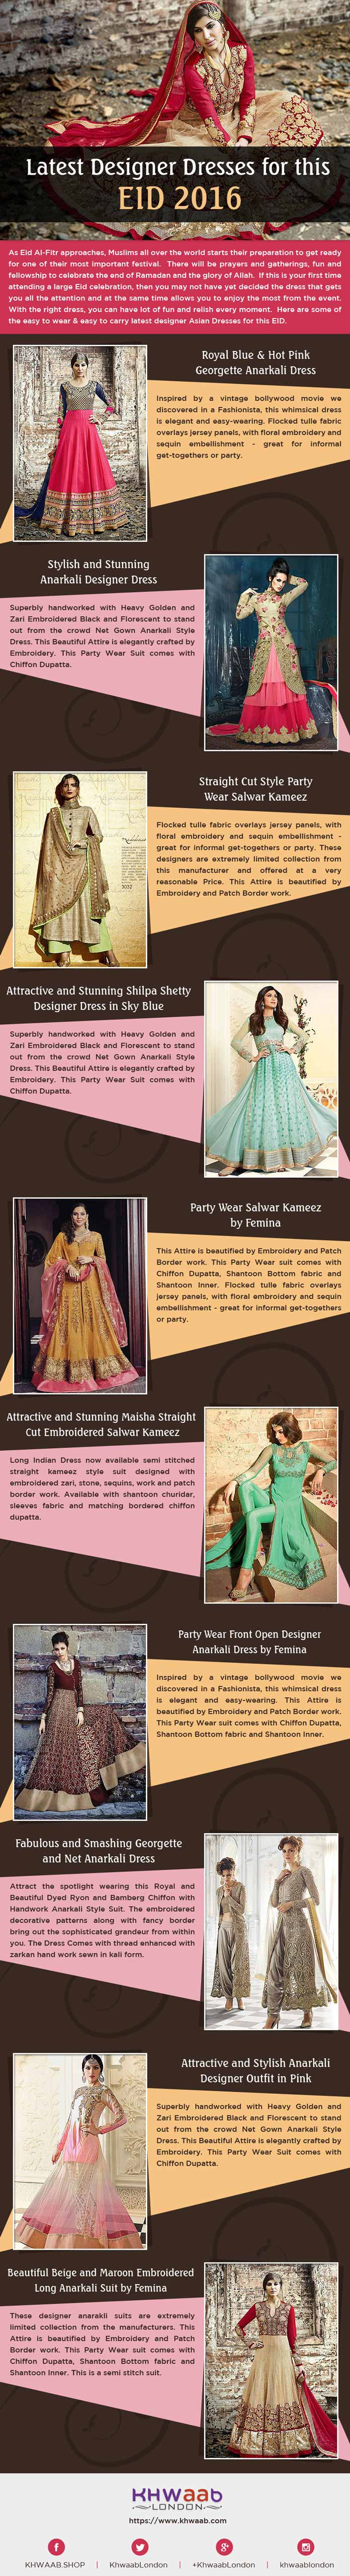 Latest Designer Dresses for This EID 2016